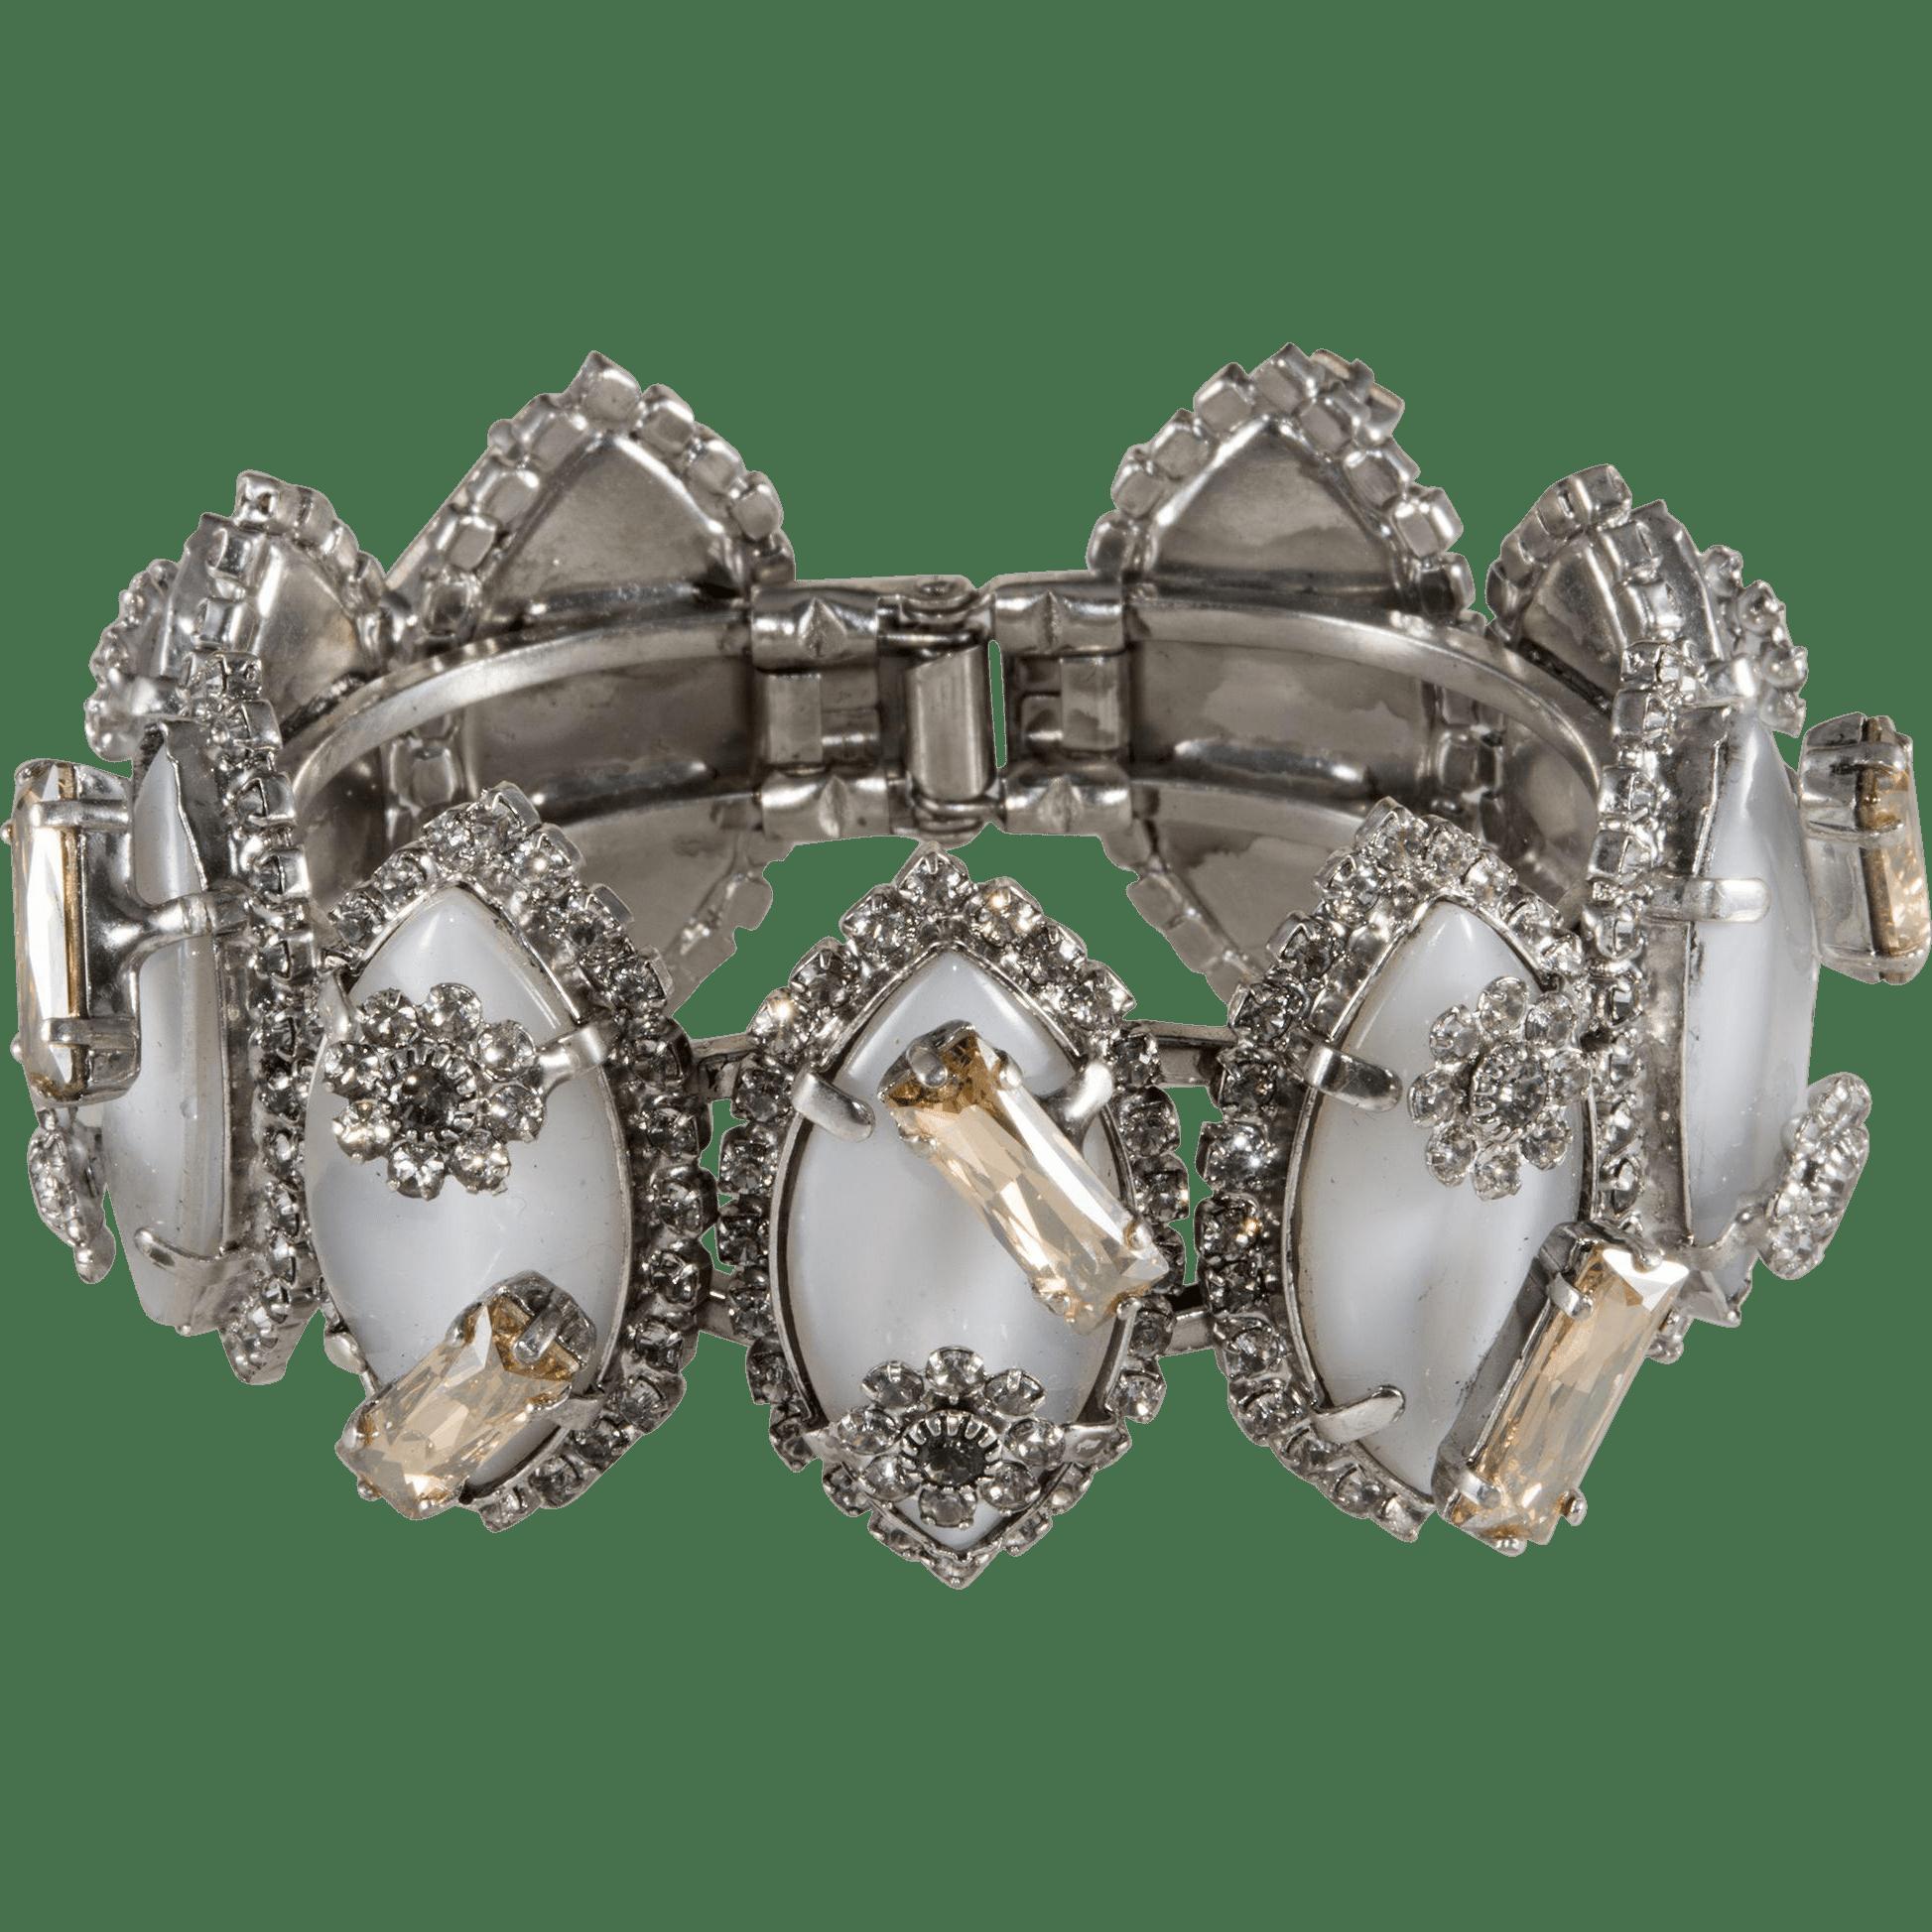 Contemporary Collectible Hinged Bracelet by Rodrigo Otazu, c. 2005